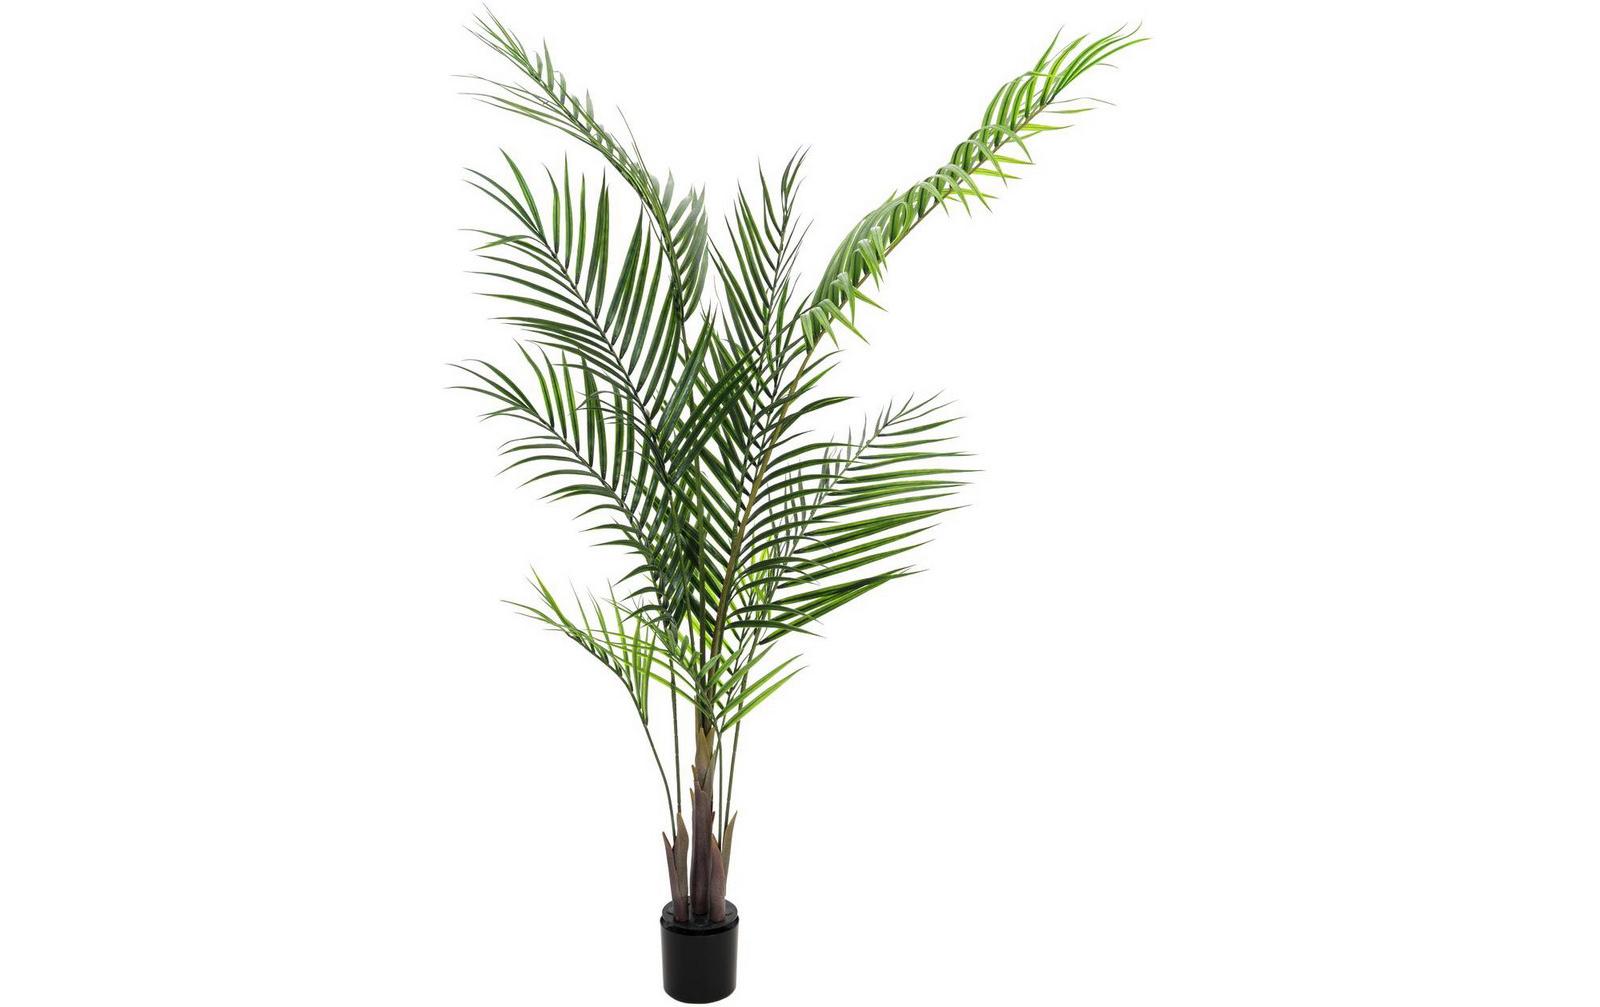 europalms-groayblatt-areca-165cm-kunststoffpflanze